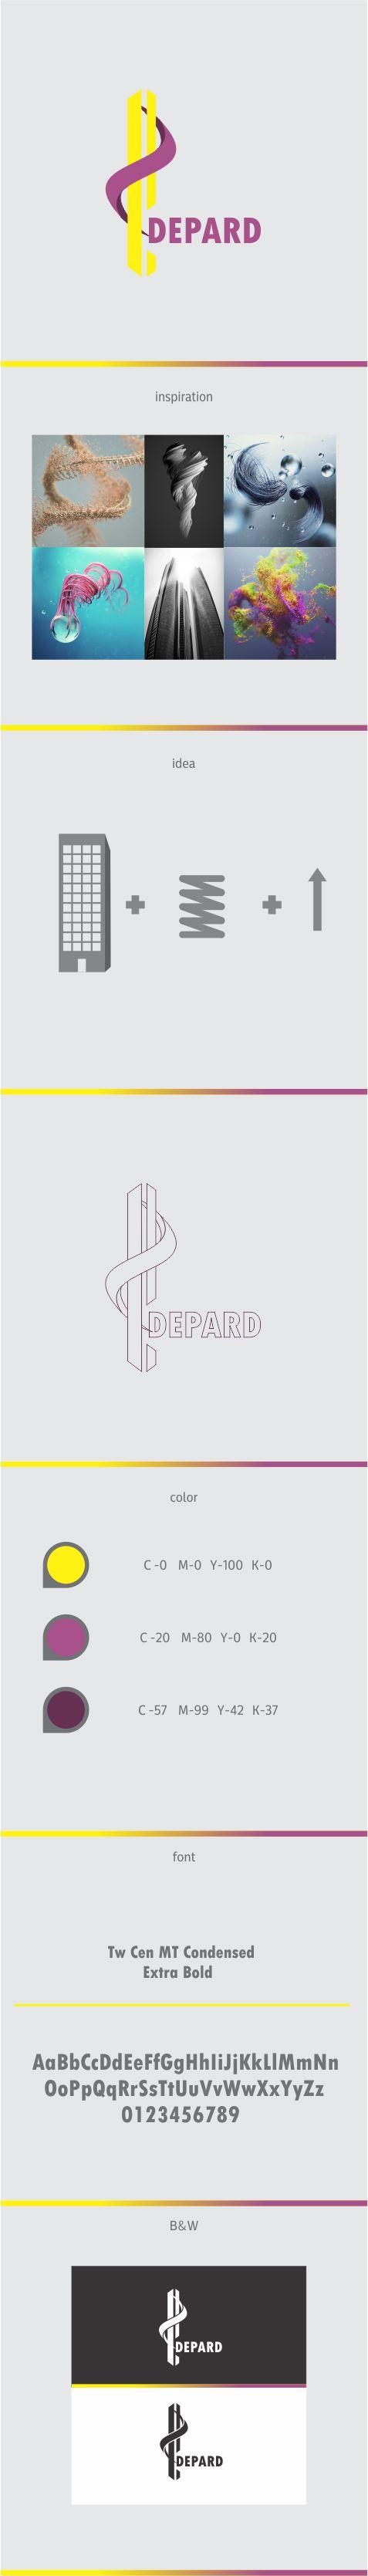 Логотип для компании (услуги недвижимость) фото f_67659345e0decc00.jpg